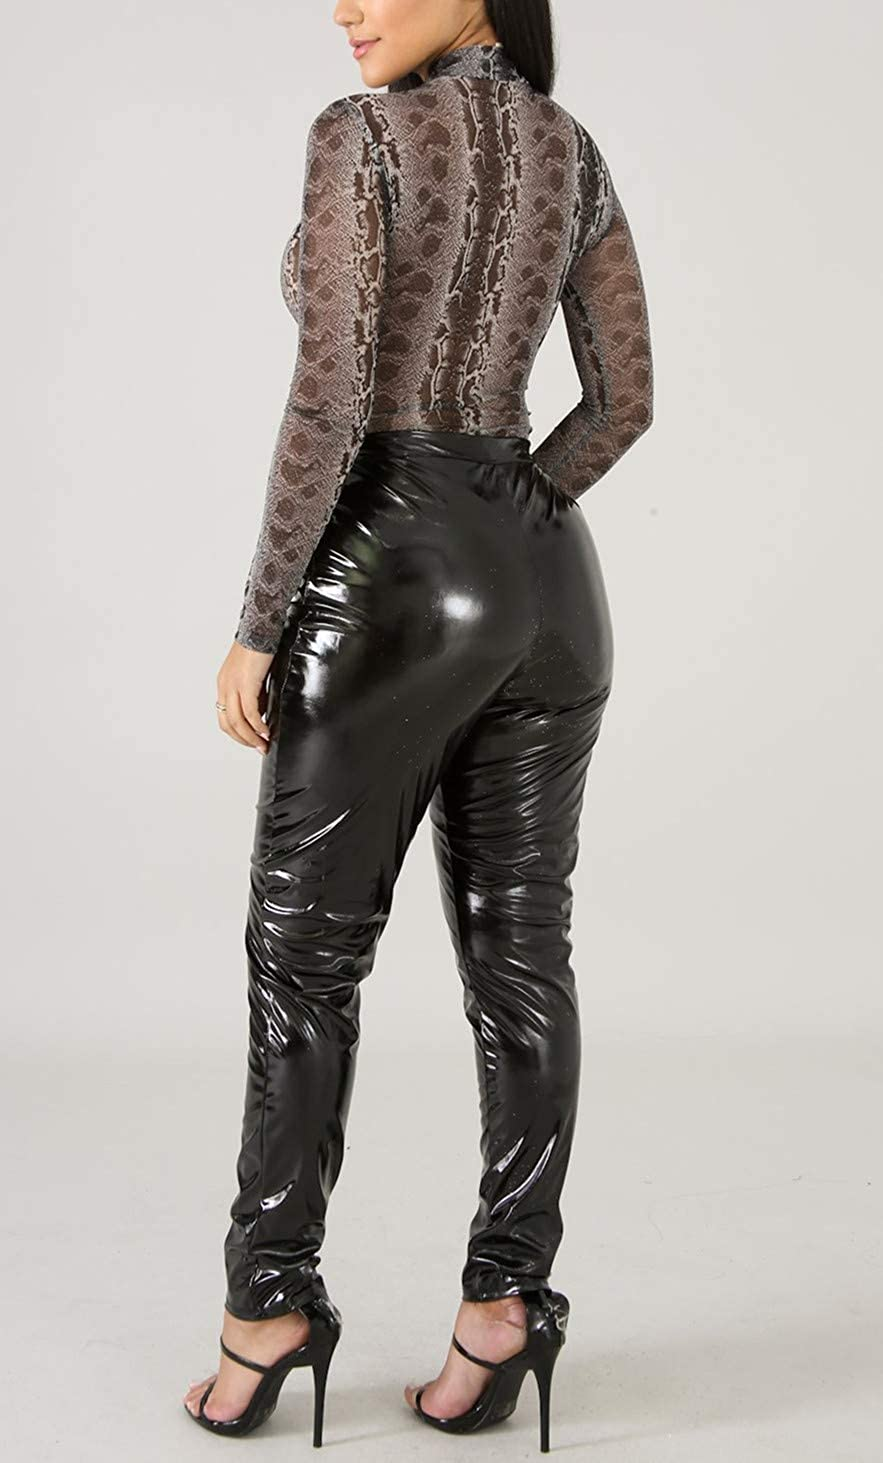 Baonmy Leather Pants Women Winter PU Faux Leather Leggings for Women Fleece Lining High Waist Leather Pant